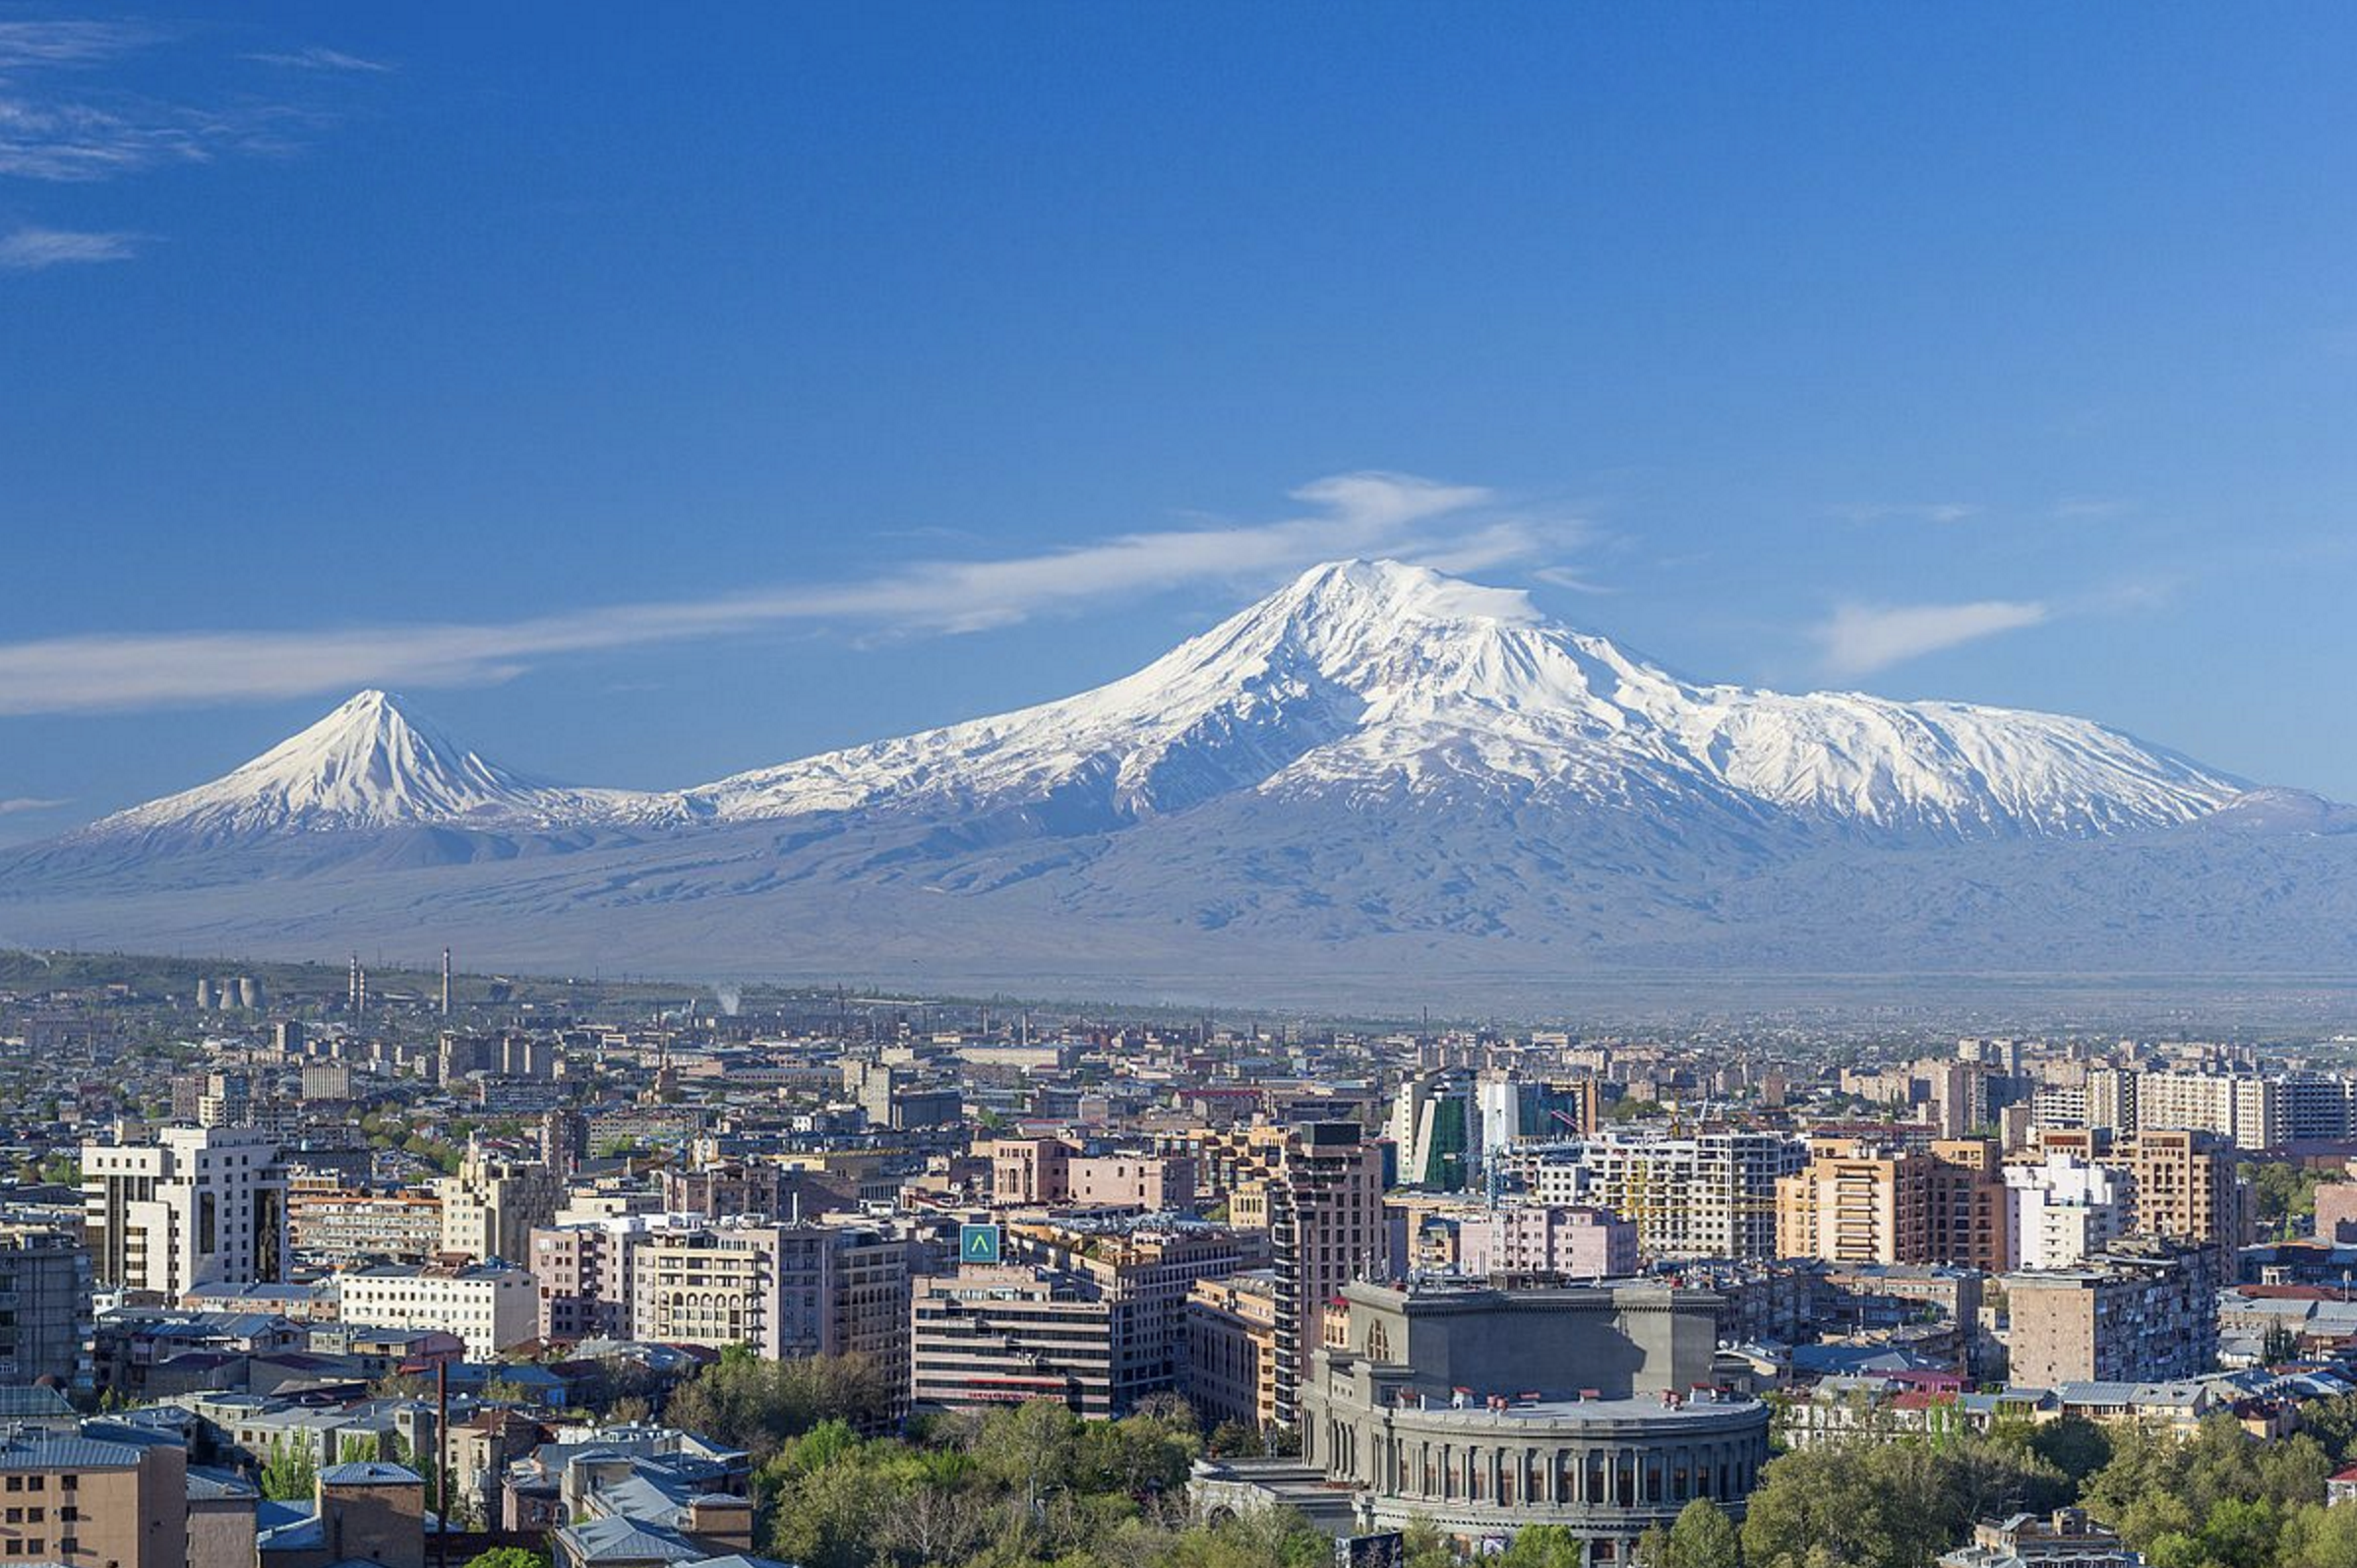 Mt. Ararat as seen from Yerevan, Armenia